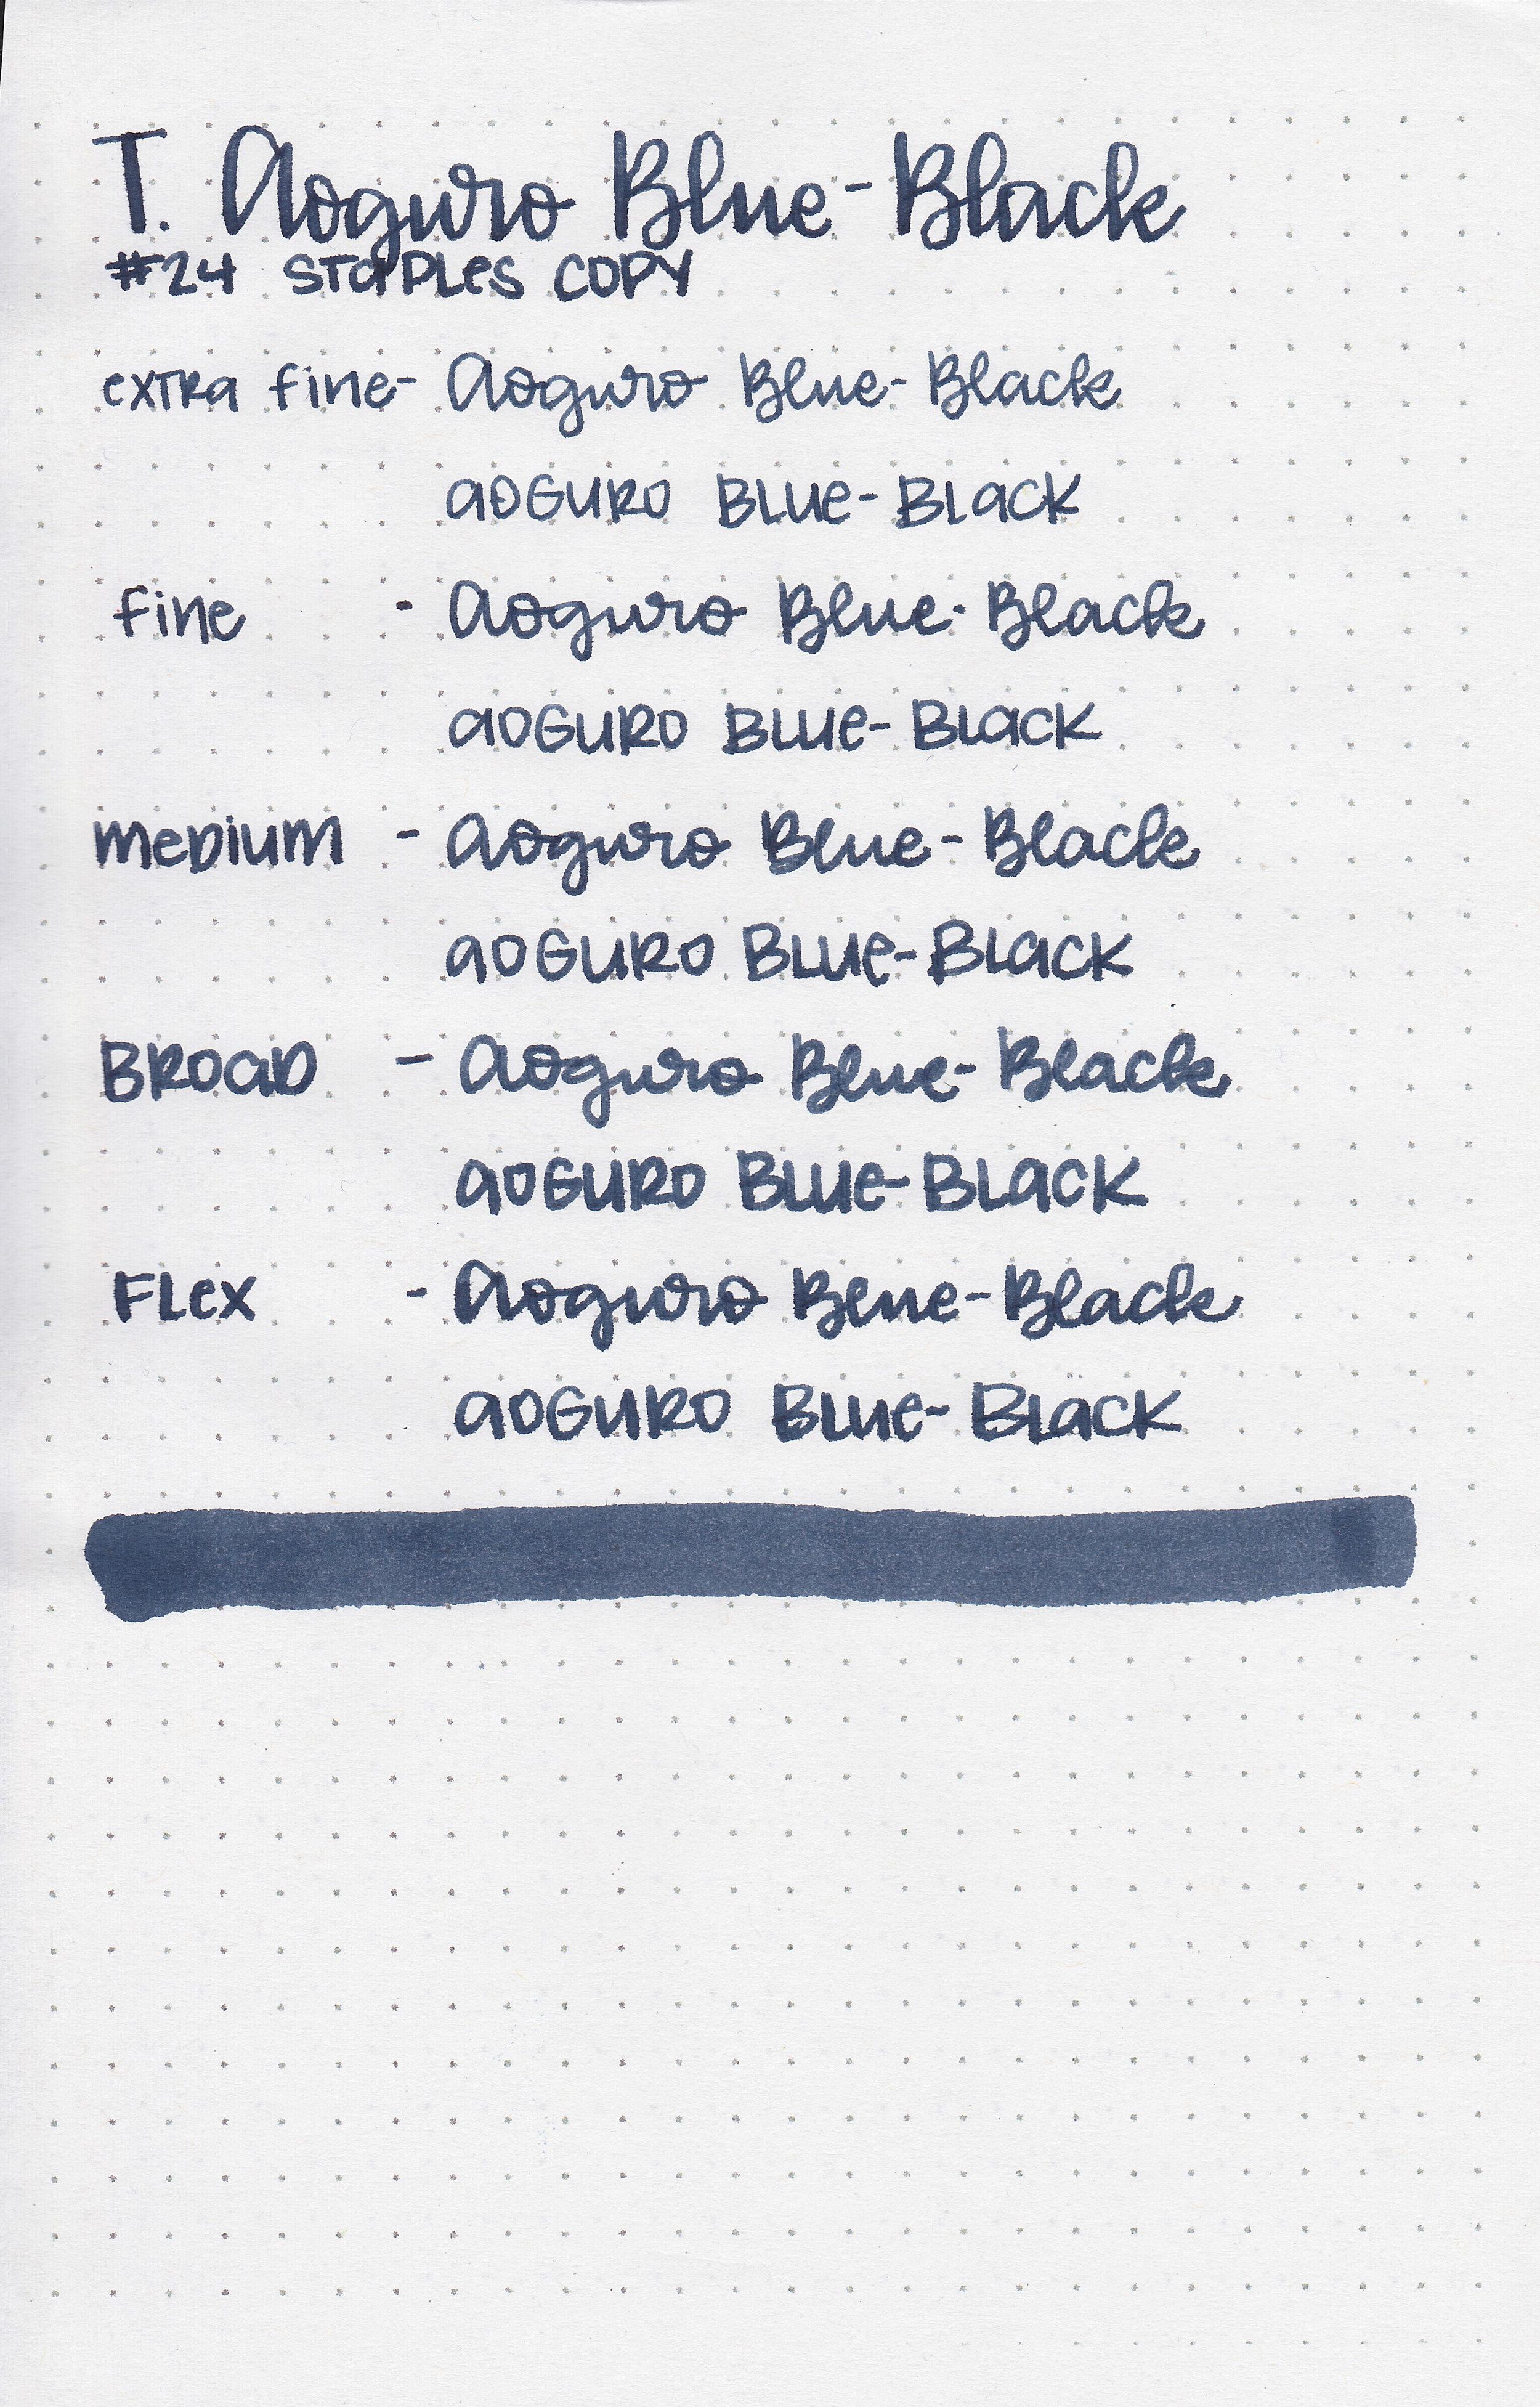 tac-aoguro-blue-black-2.jpg